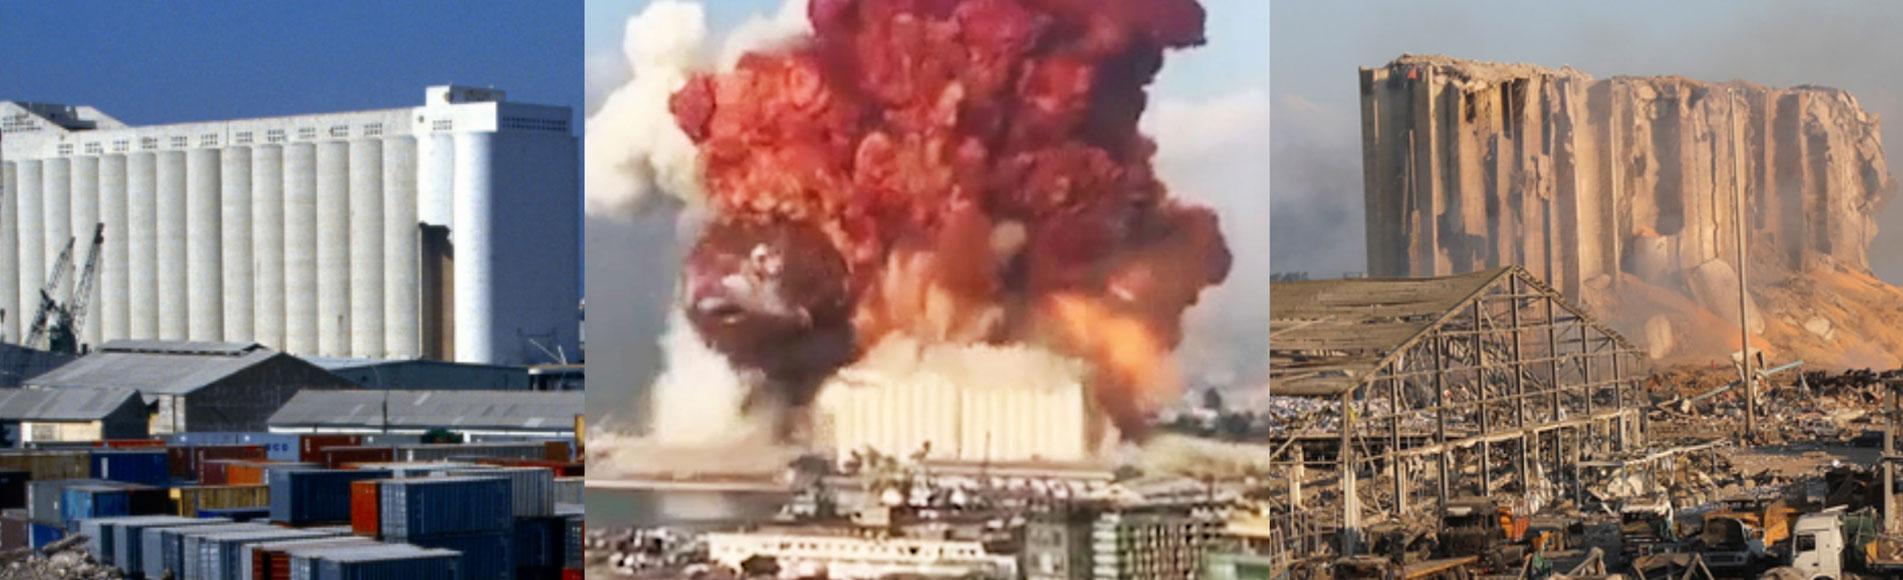 Beirut Blast Response